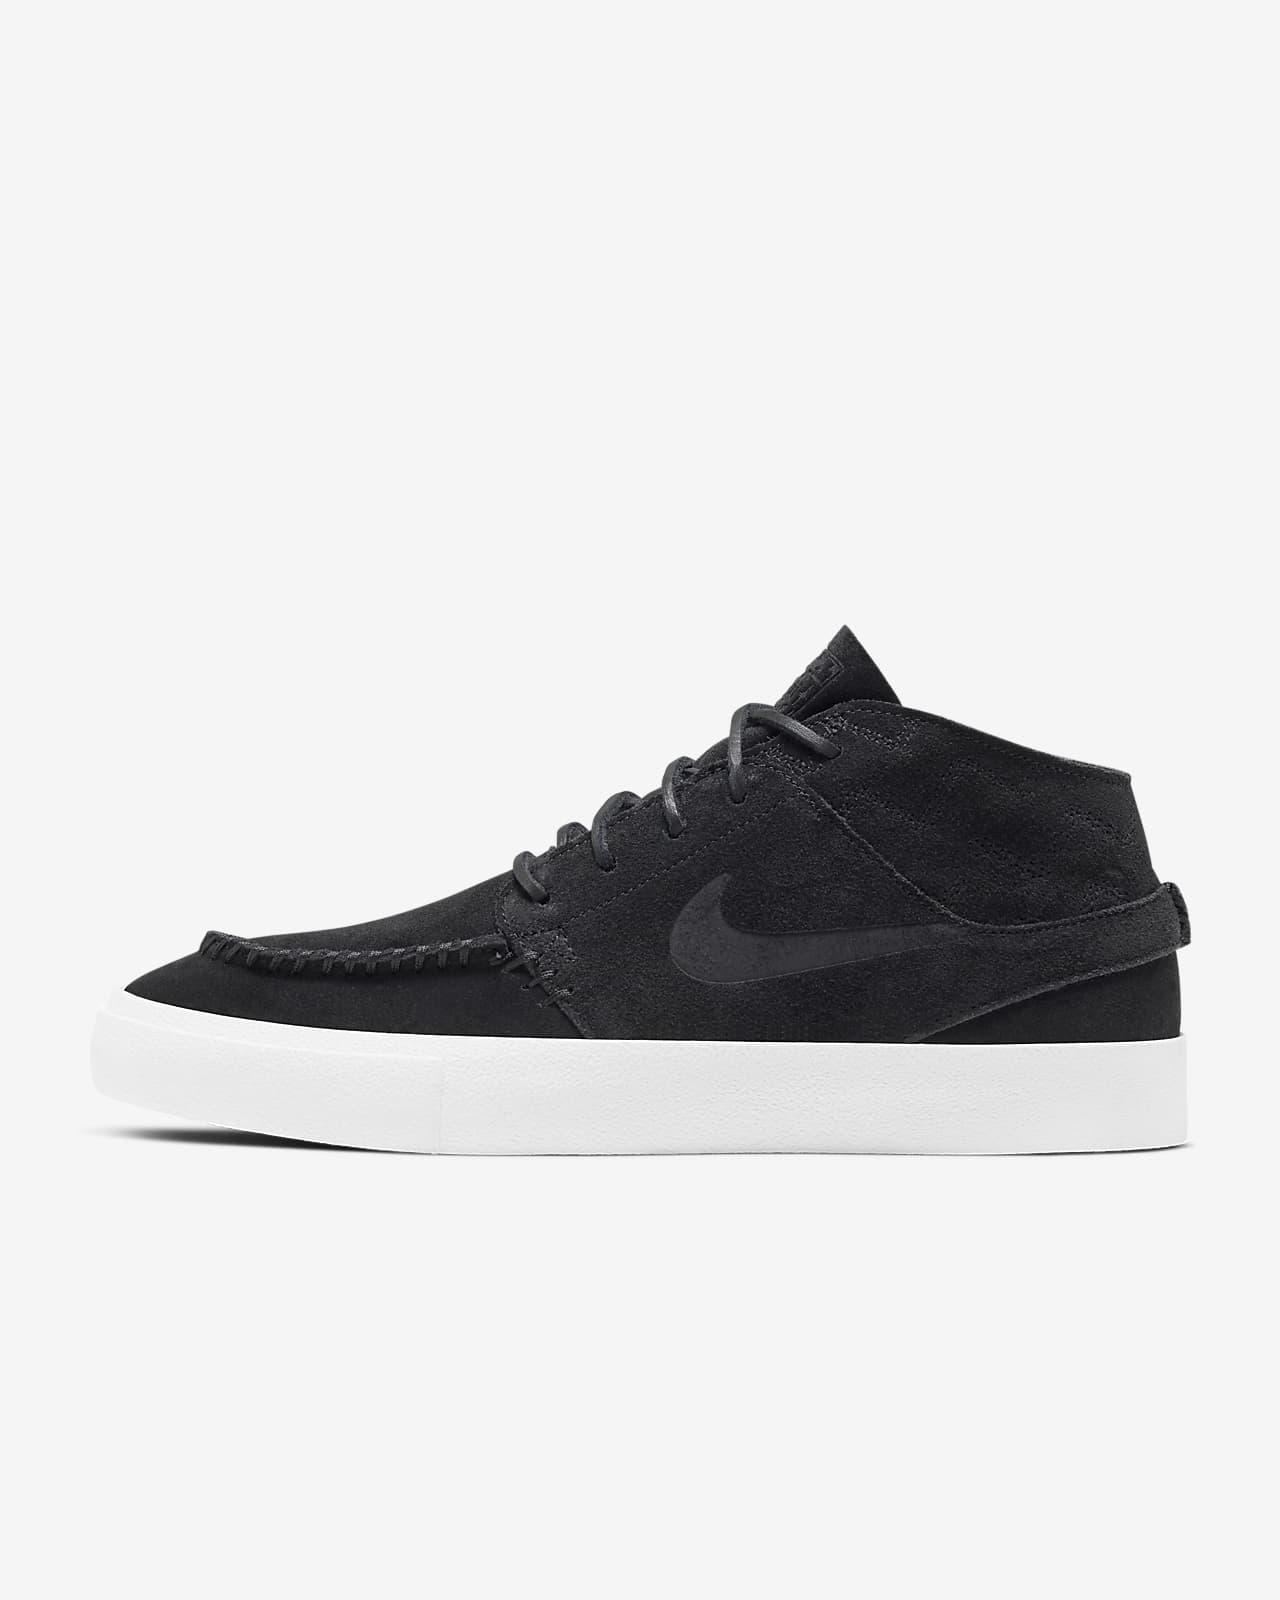 Nike SB Zoom Stefan Janoski Mid Crafted Skate Shoe